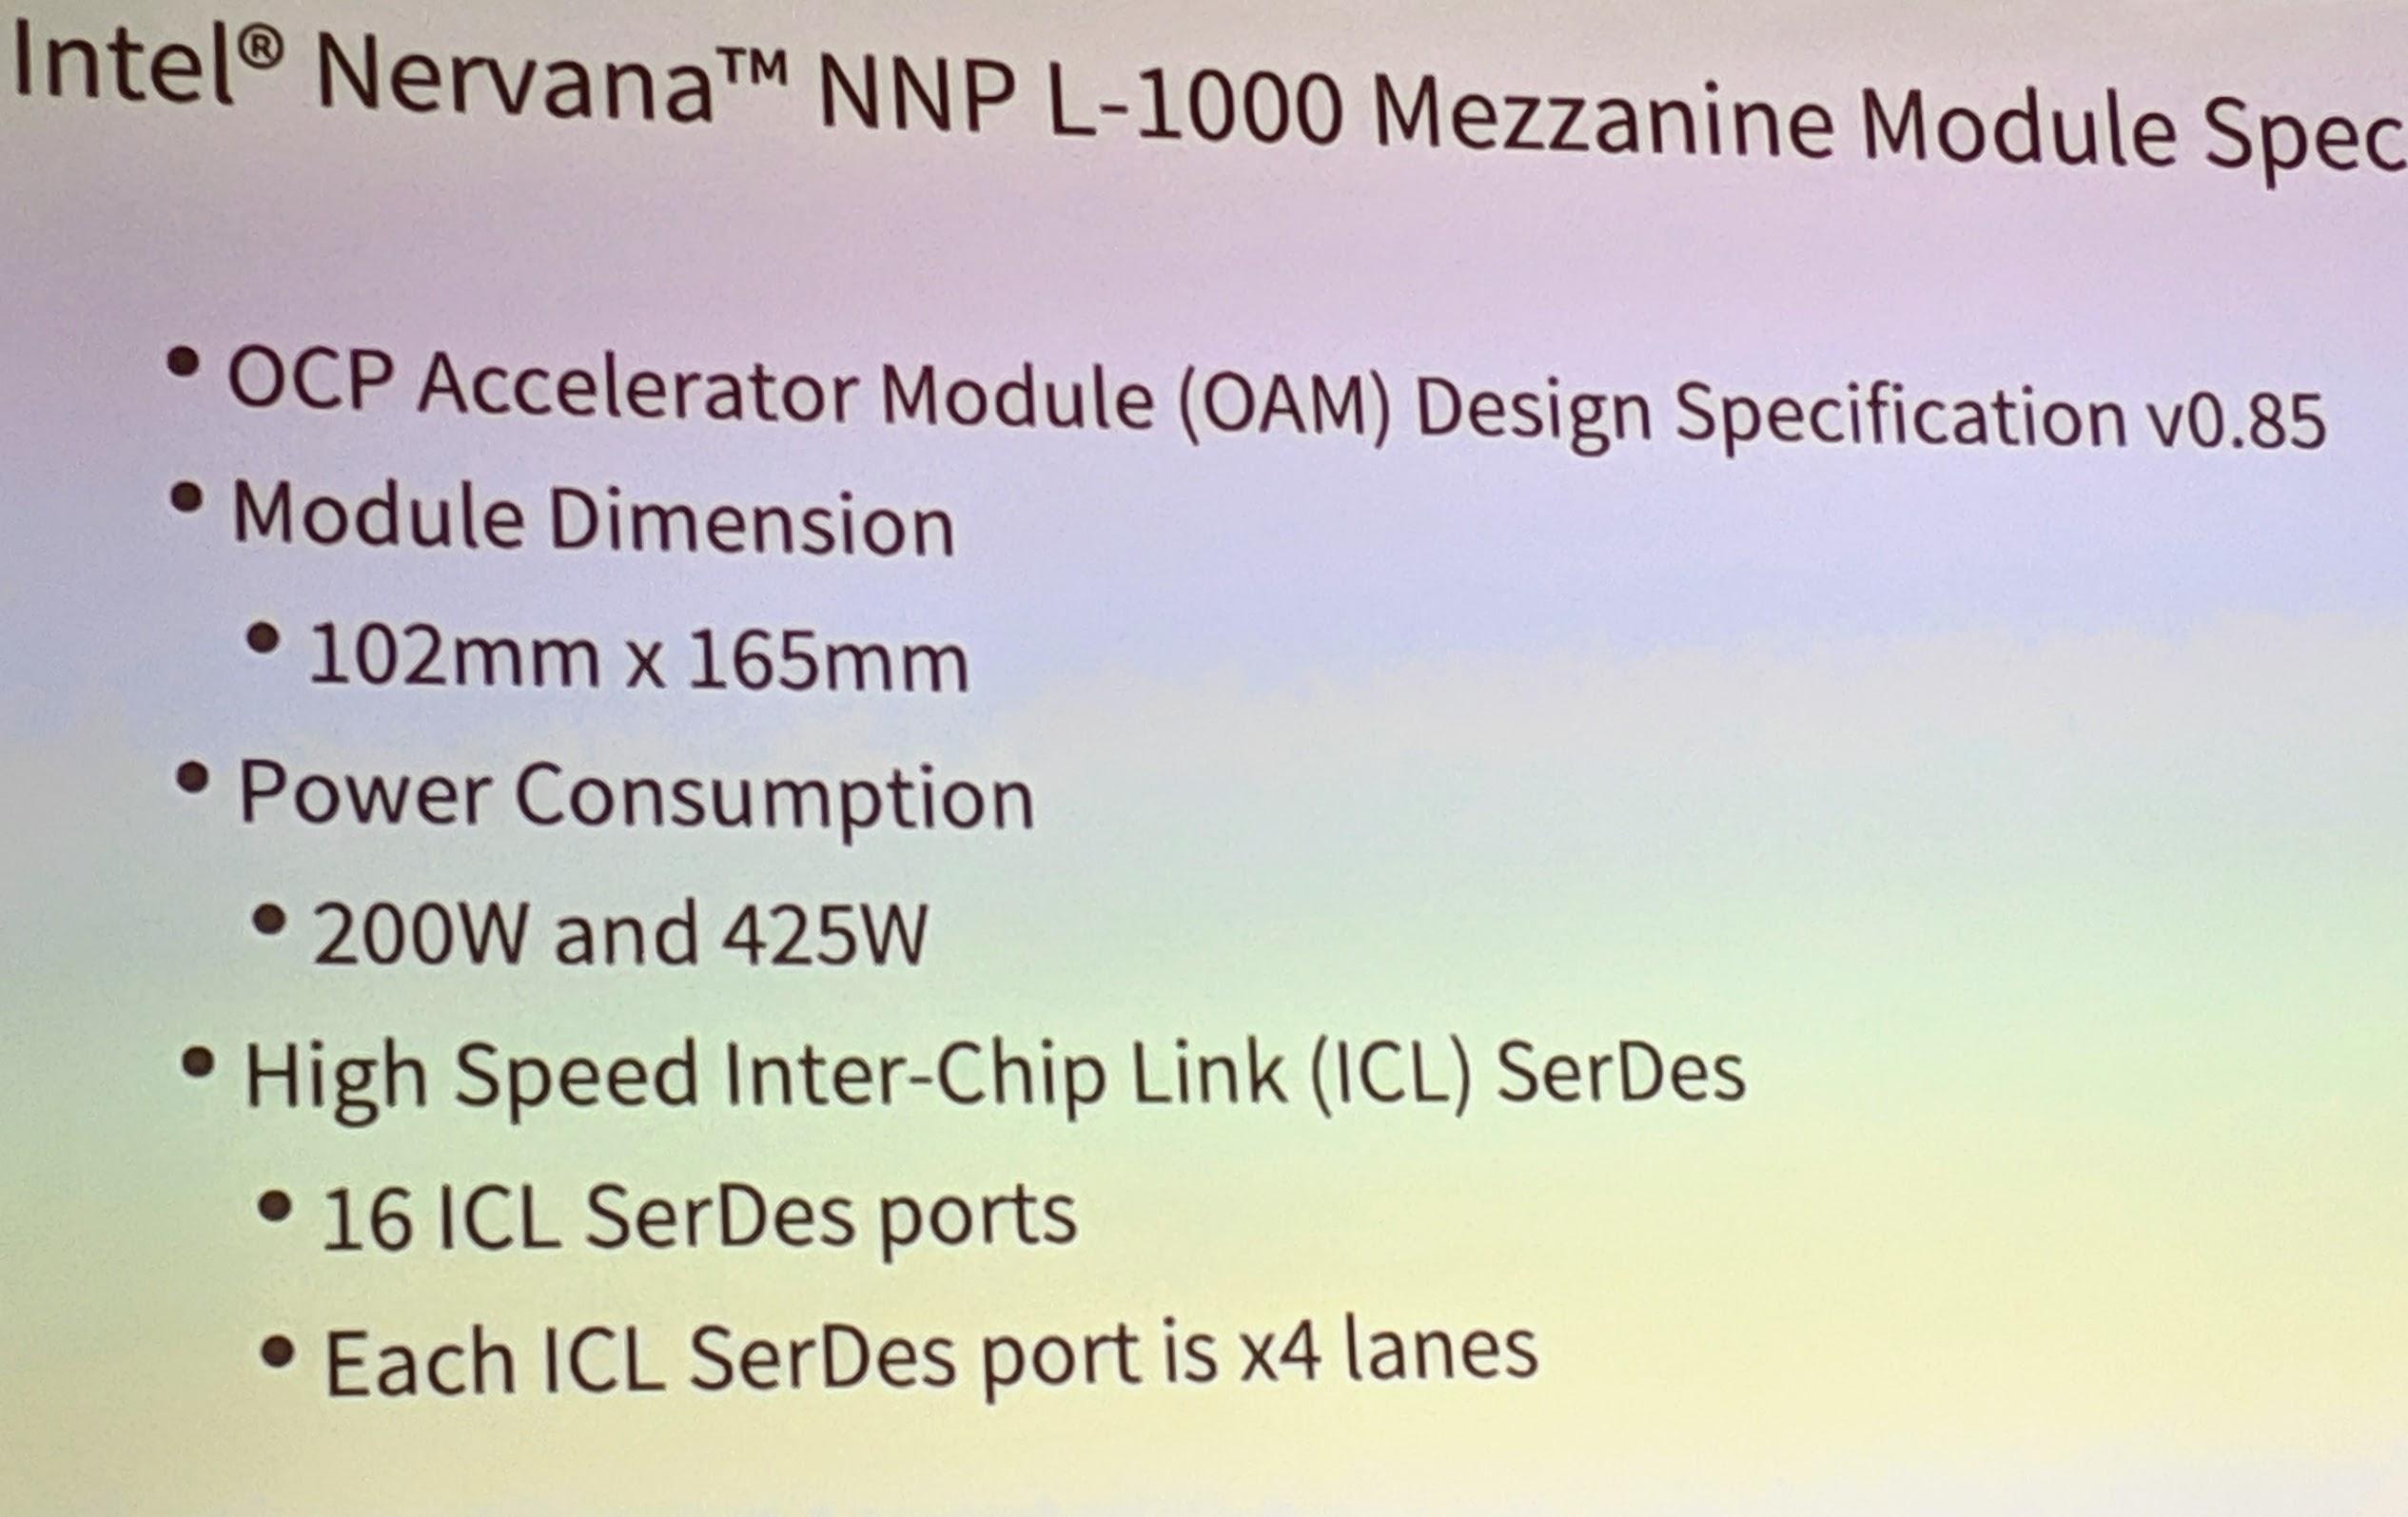 Intel Nervana NNP L 1000 Mezzanine Specs